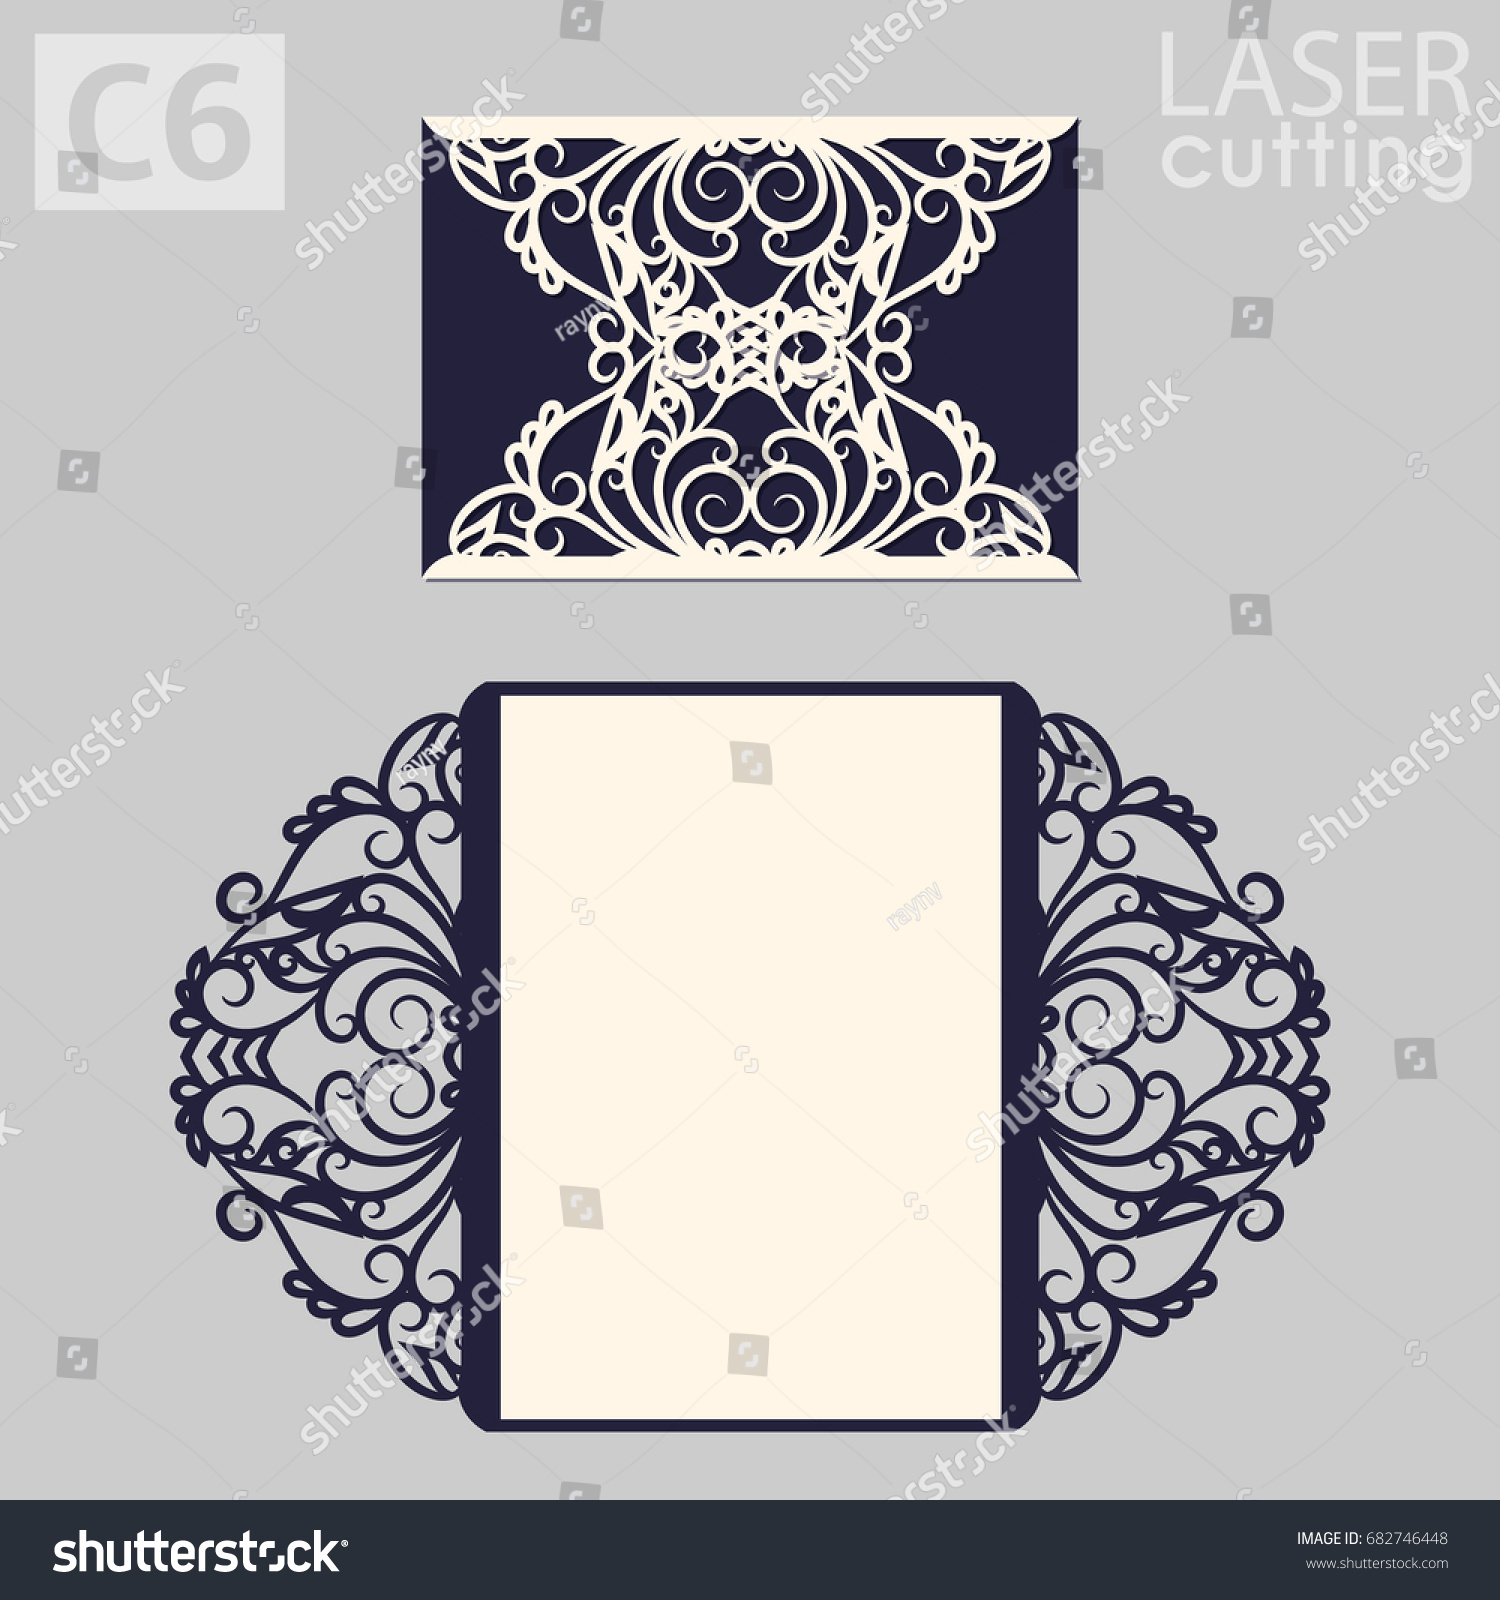 Laser Cut Wedding Invitation Card Template Stock Vector 682746448 ...